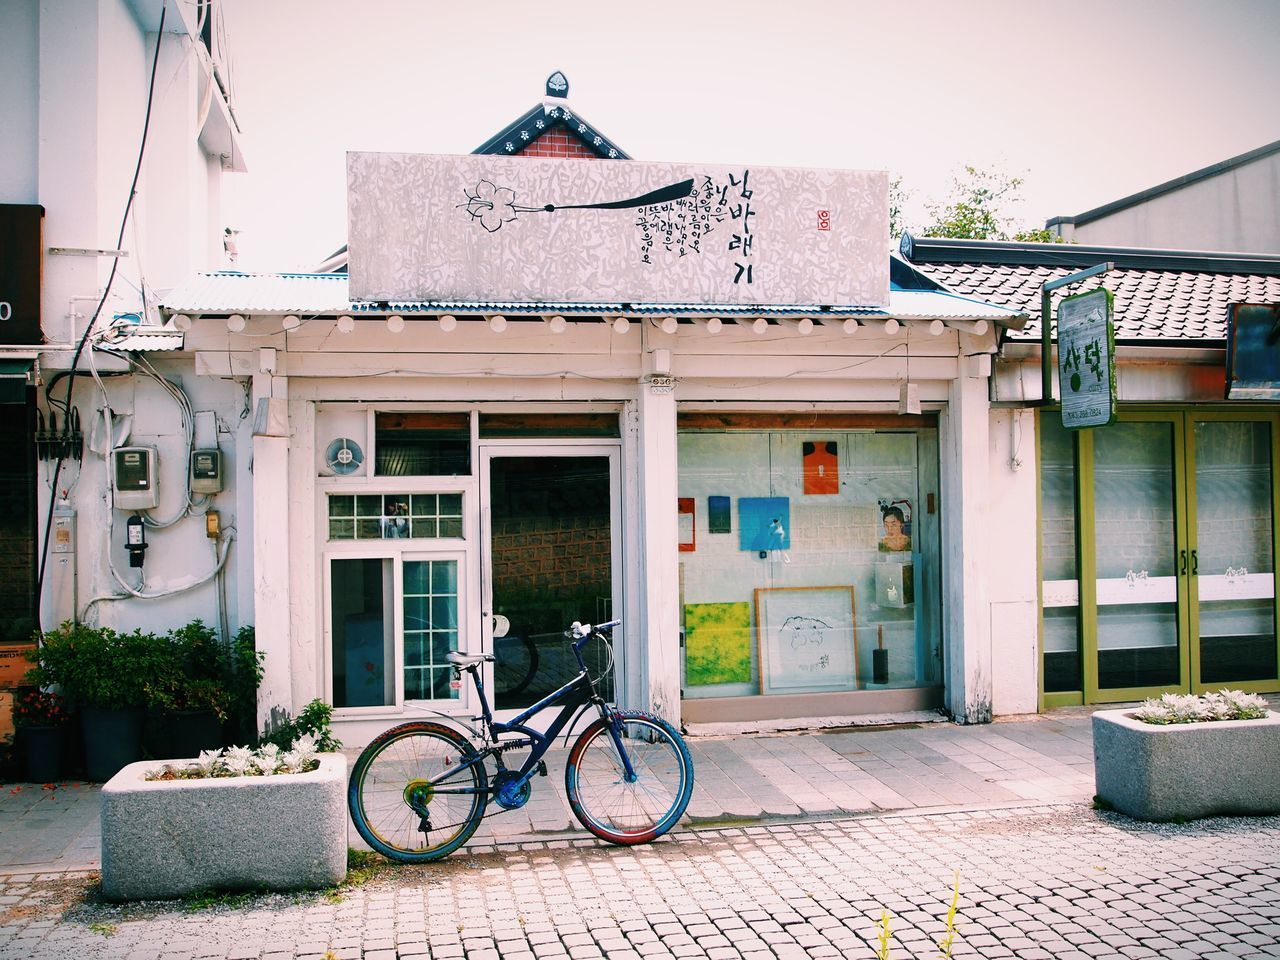 BICYCLE BY BUILDING AGAINST RESIDENTIAL BUILDINGS